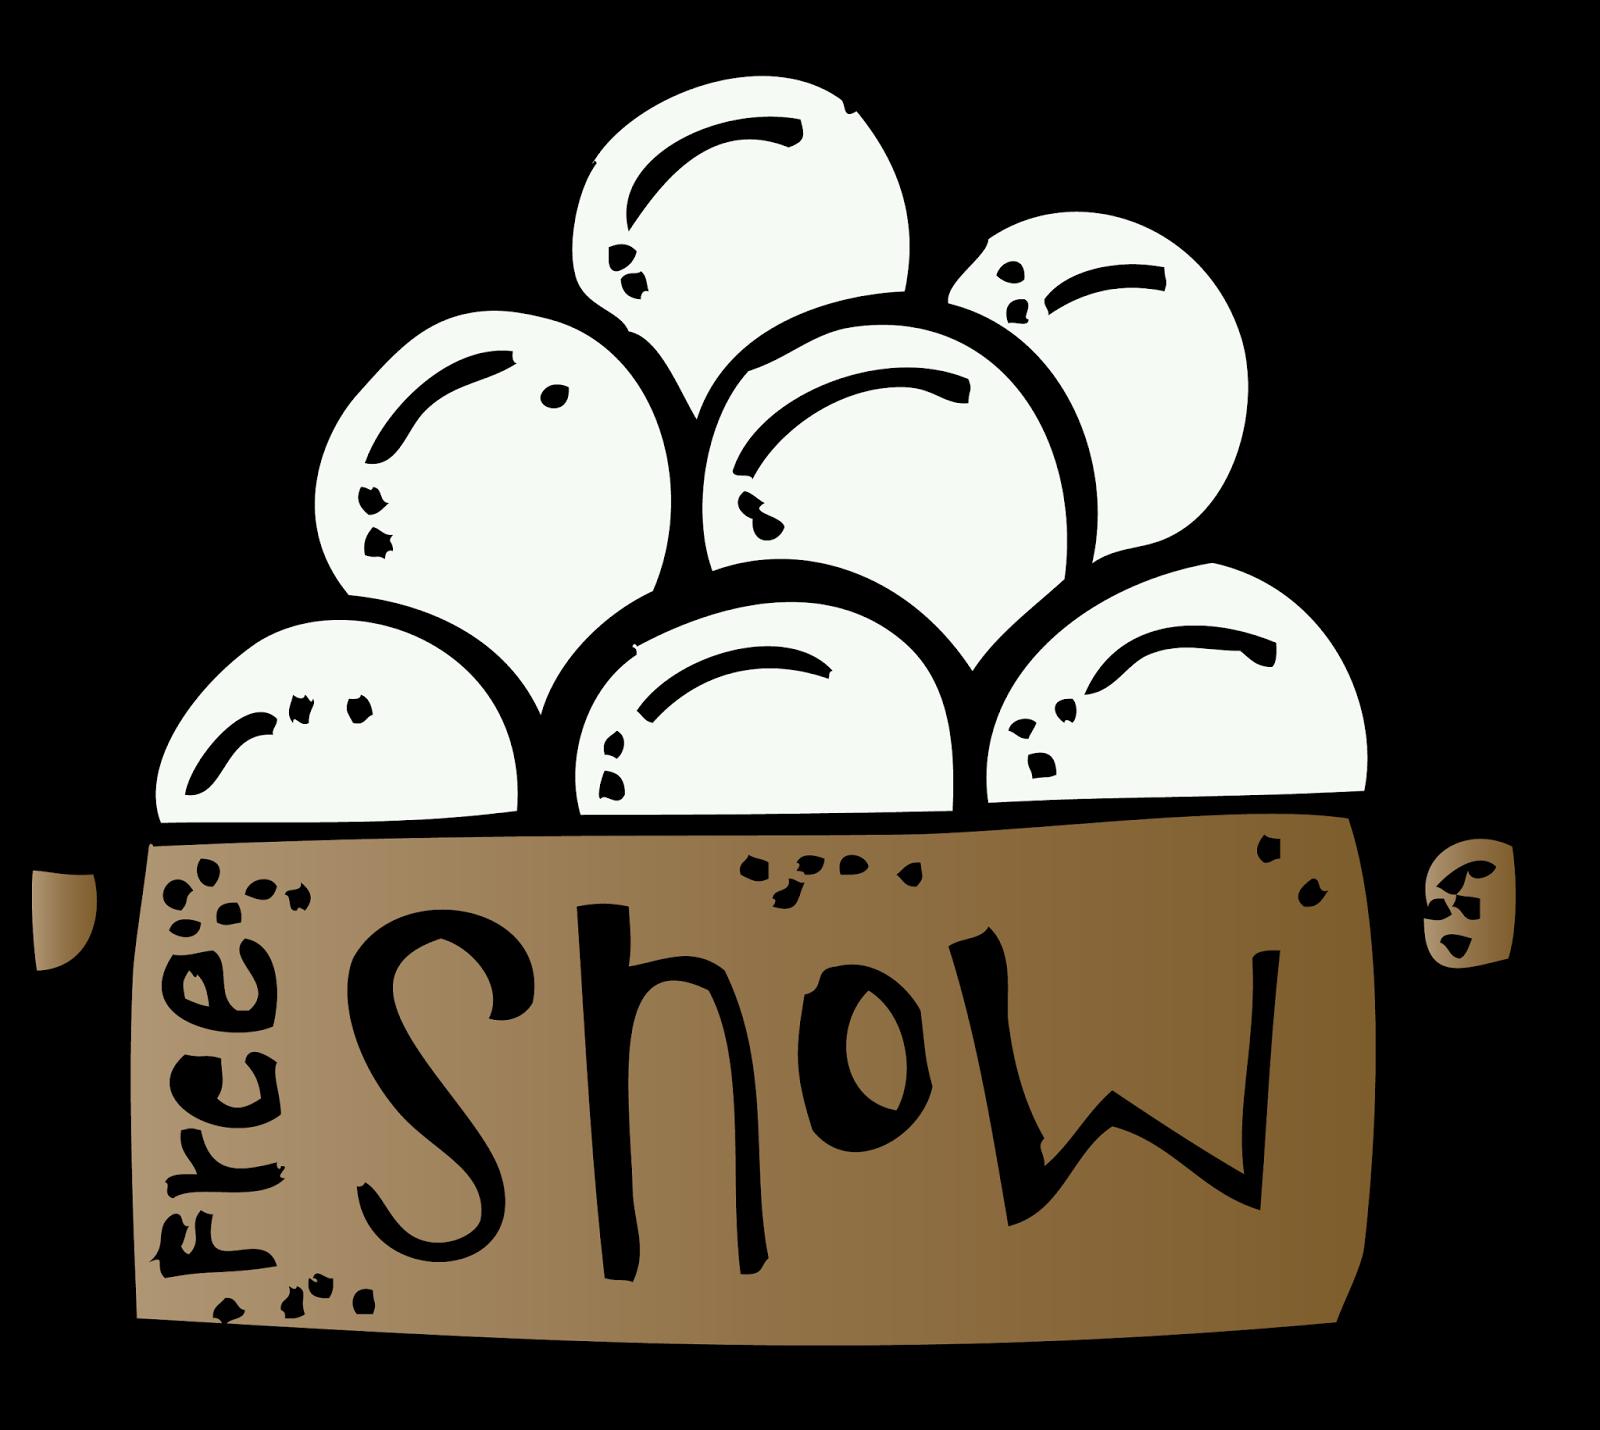 Snowman snowflake clipart black and white download Snow Images Clipart | Free download best Snow Images Clipart on ... black and white download